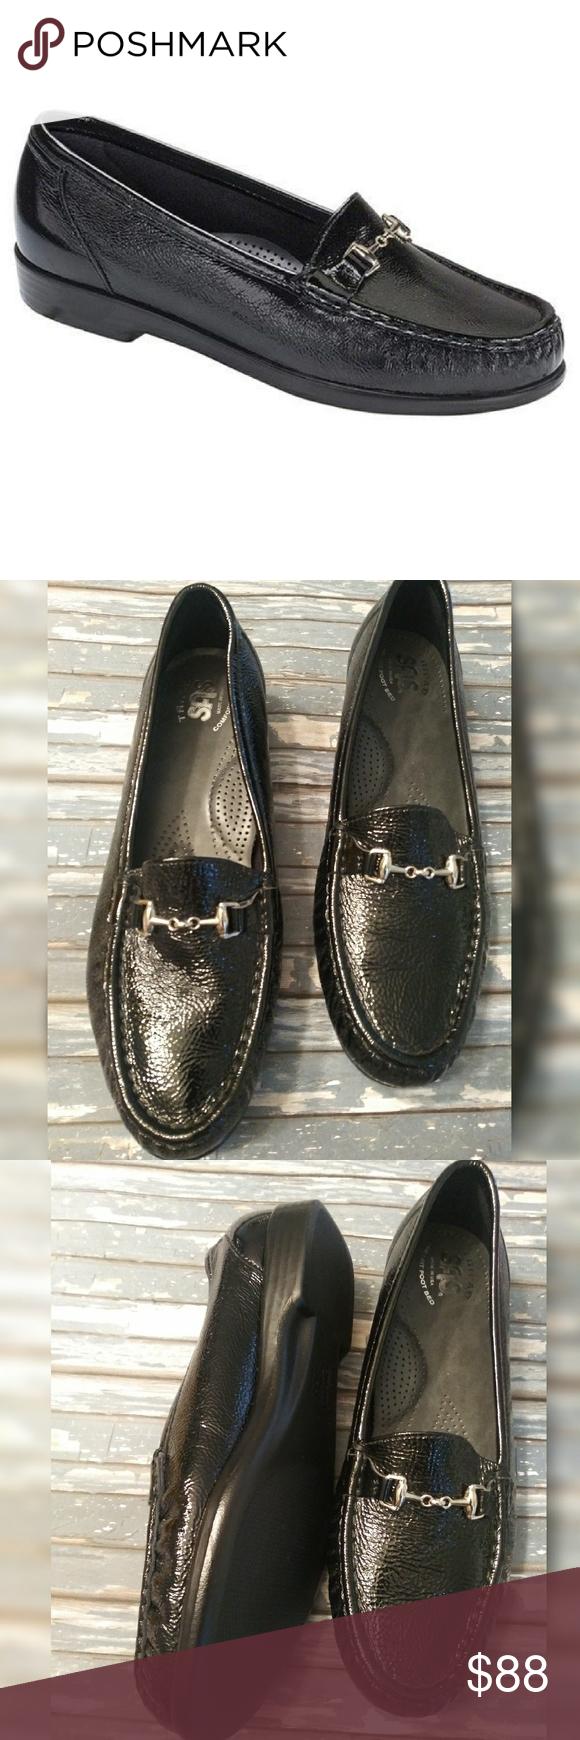 Nwot Sas Women S Metro Slip On Loafers Loafers Slip On Flat Shoes Women